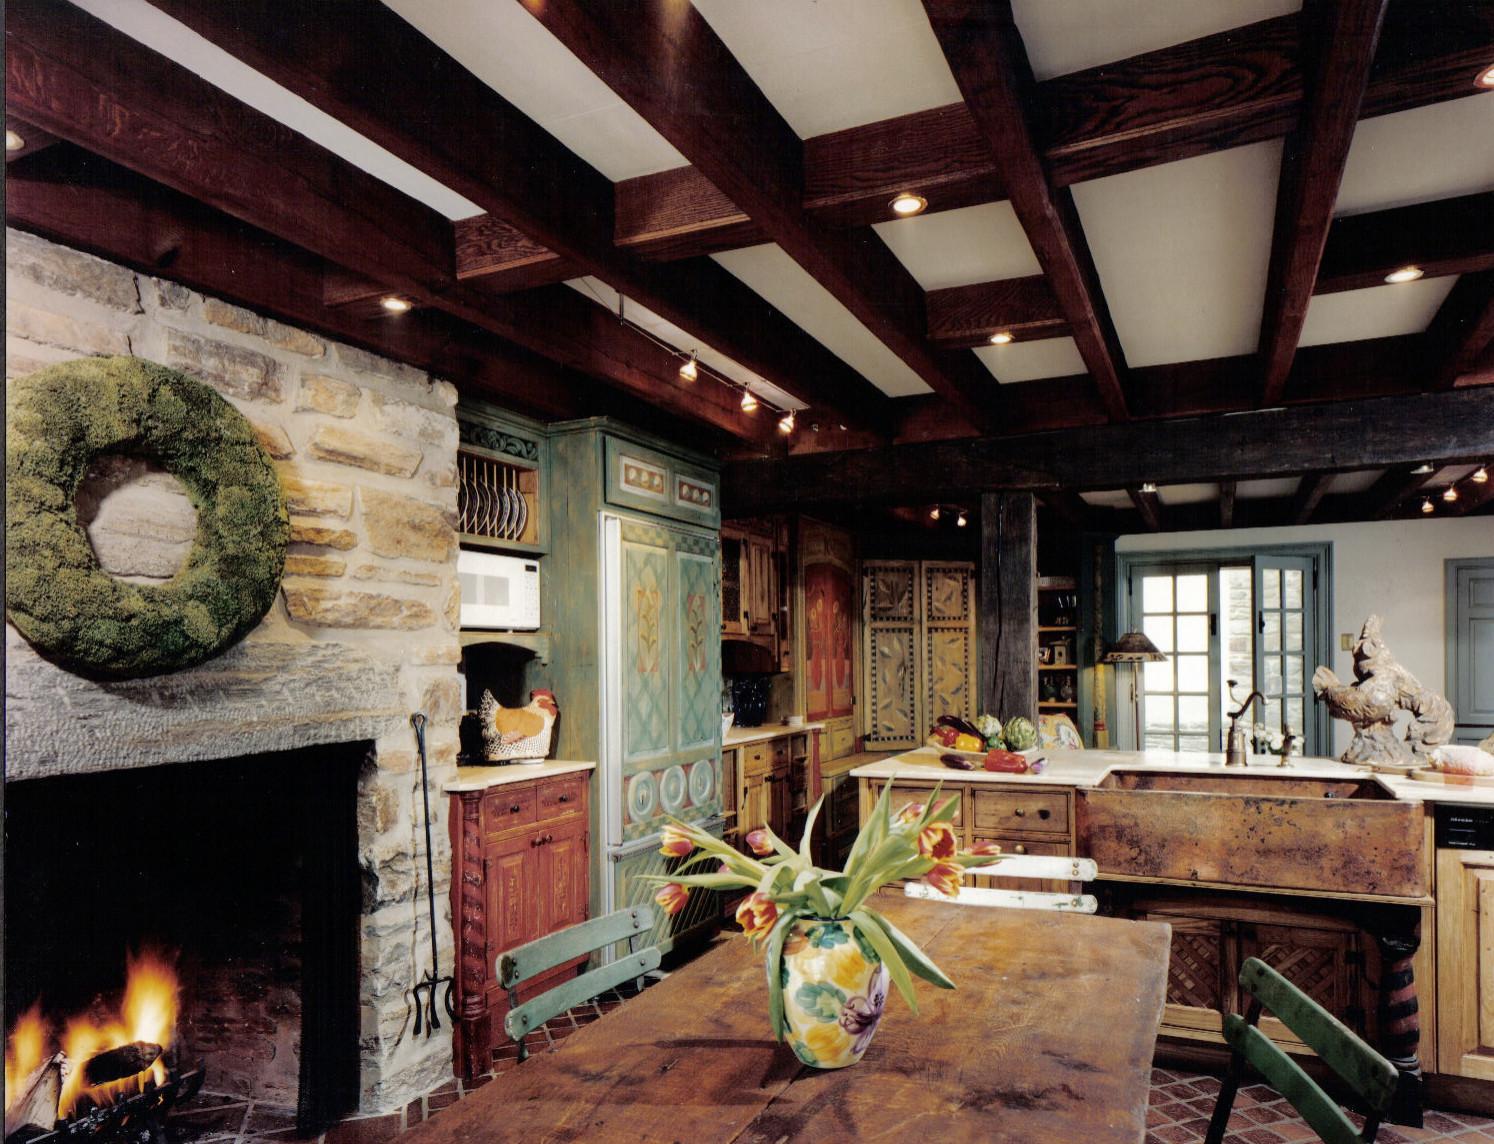 1801 Historic Kitchen Renovation, Gladwyne, PA